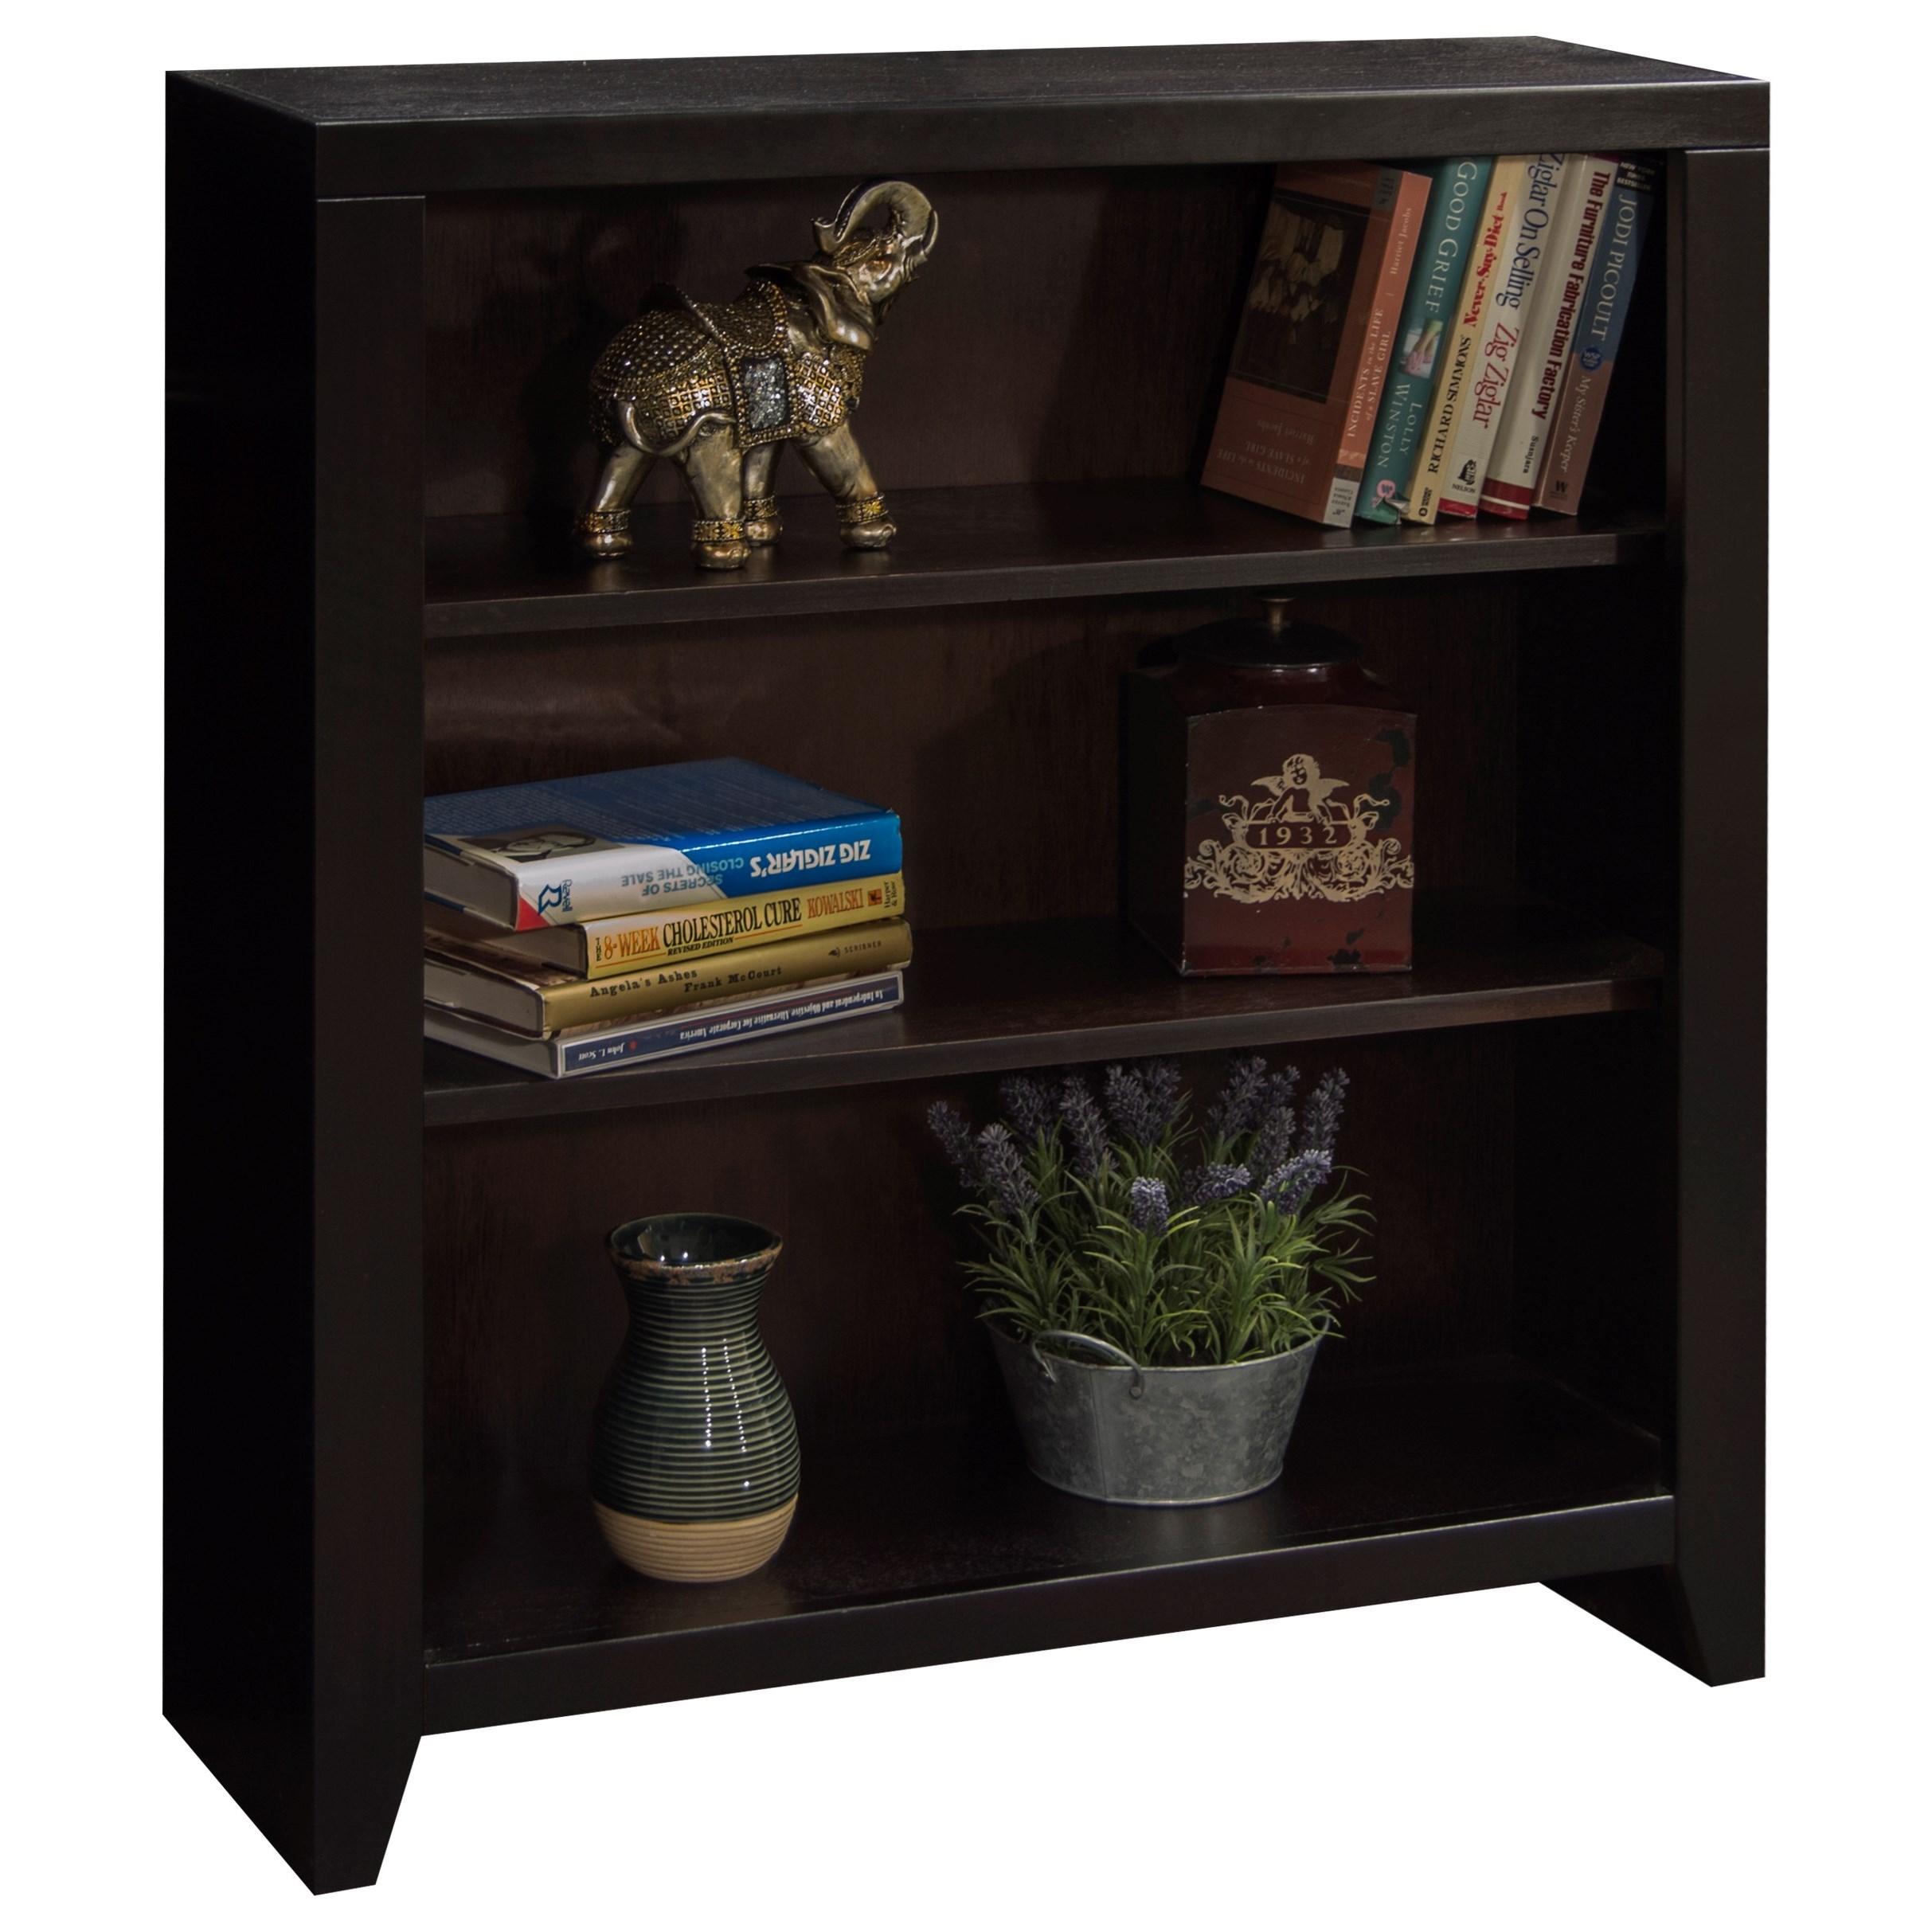 Legends Furniture Urban Loft Ul6636 Moc 36 Bookcase